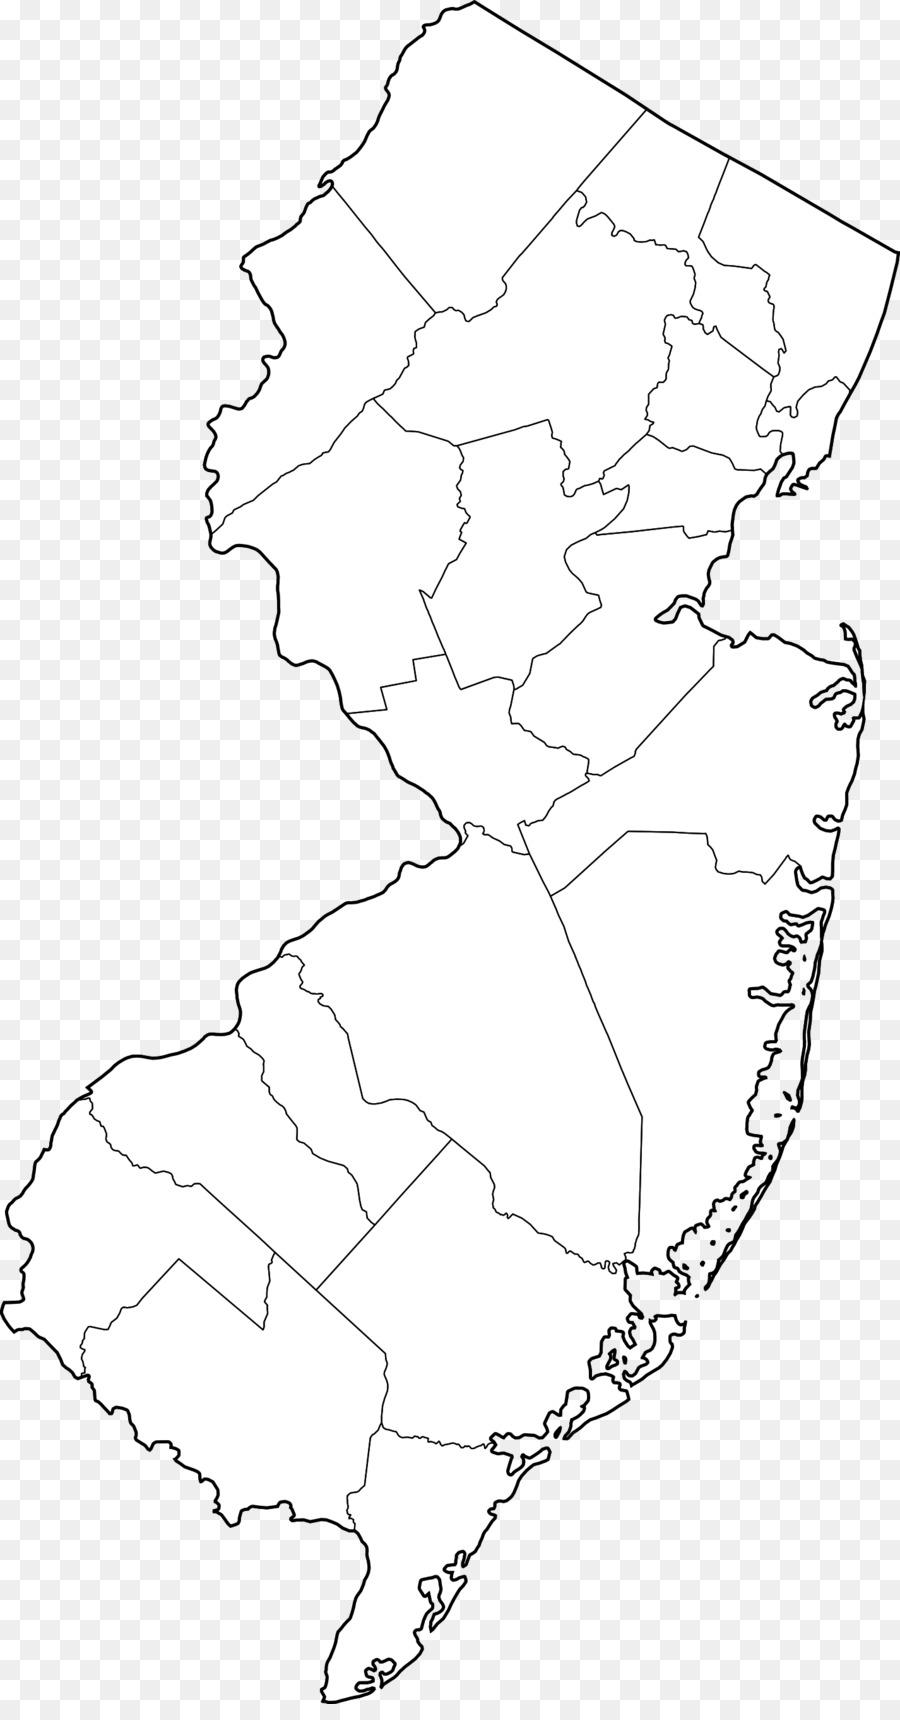 Ocean County Nj Map on